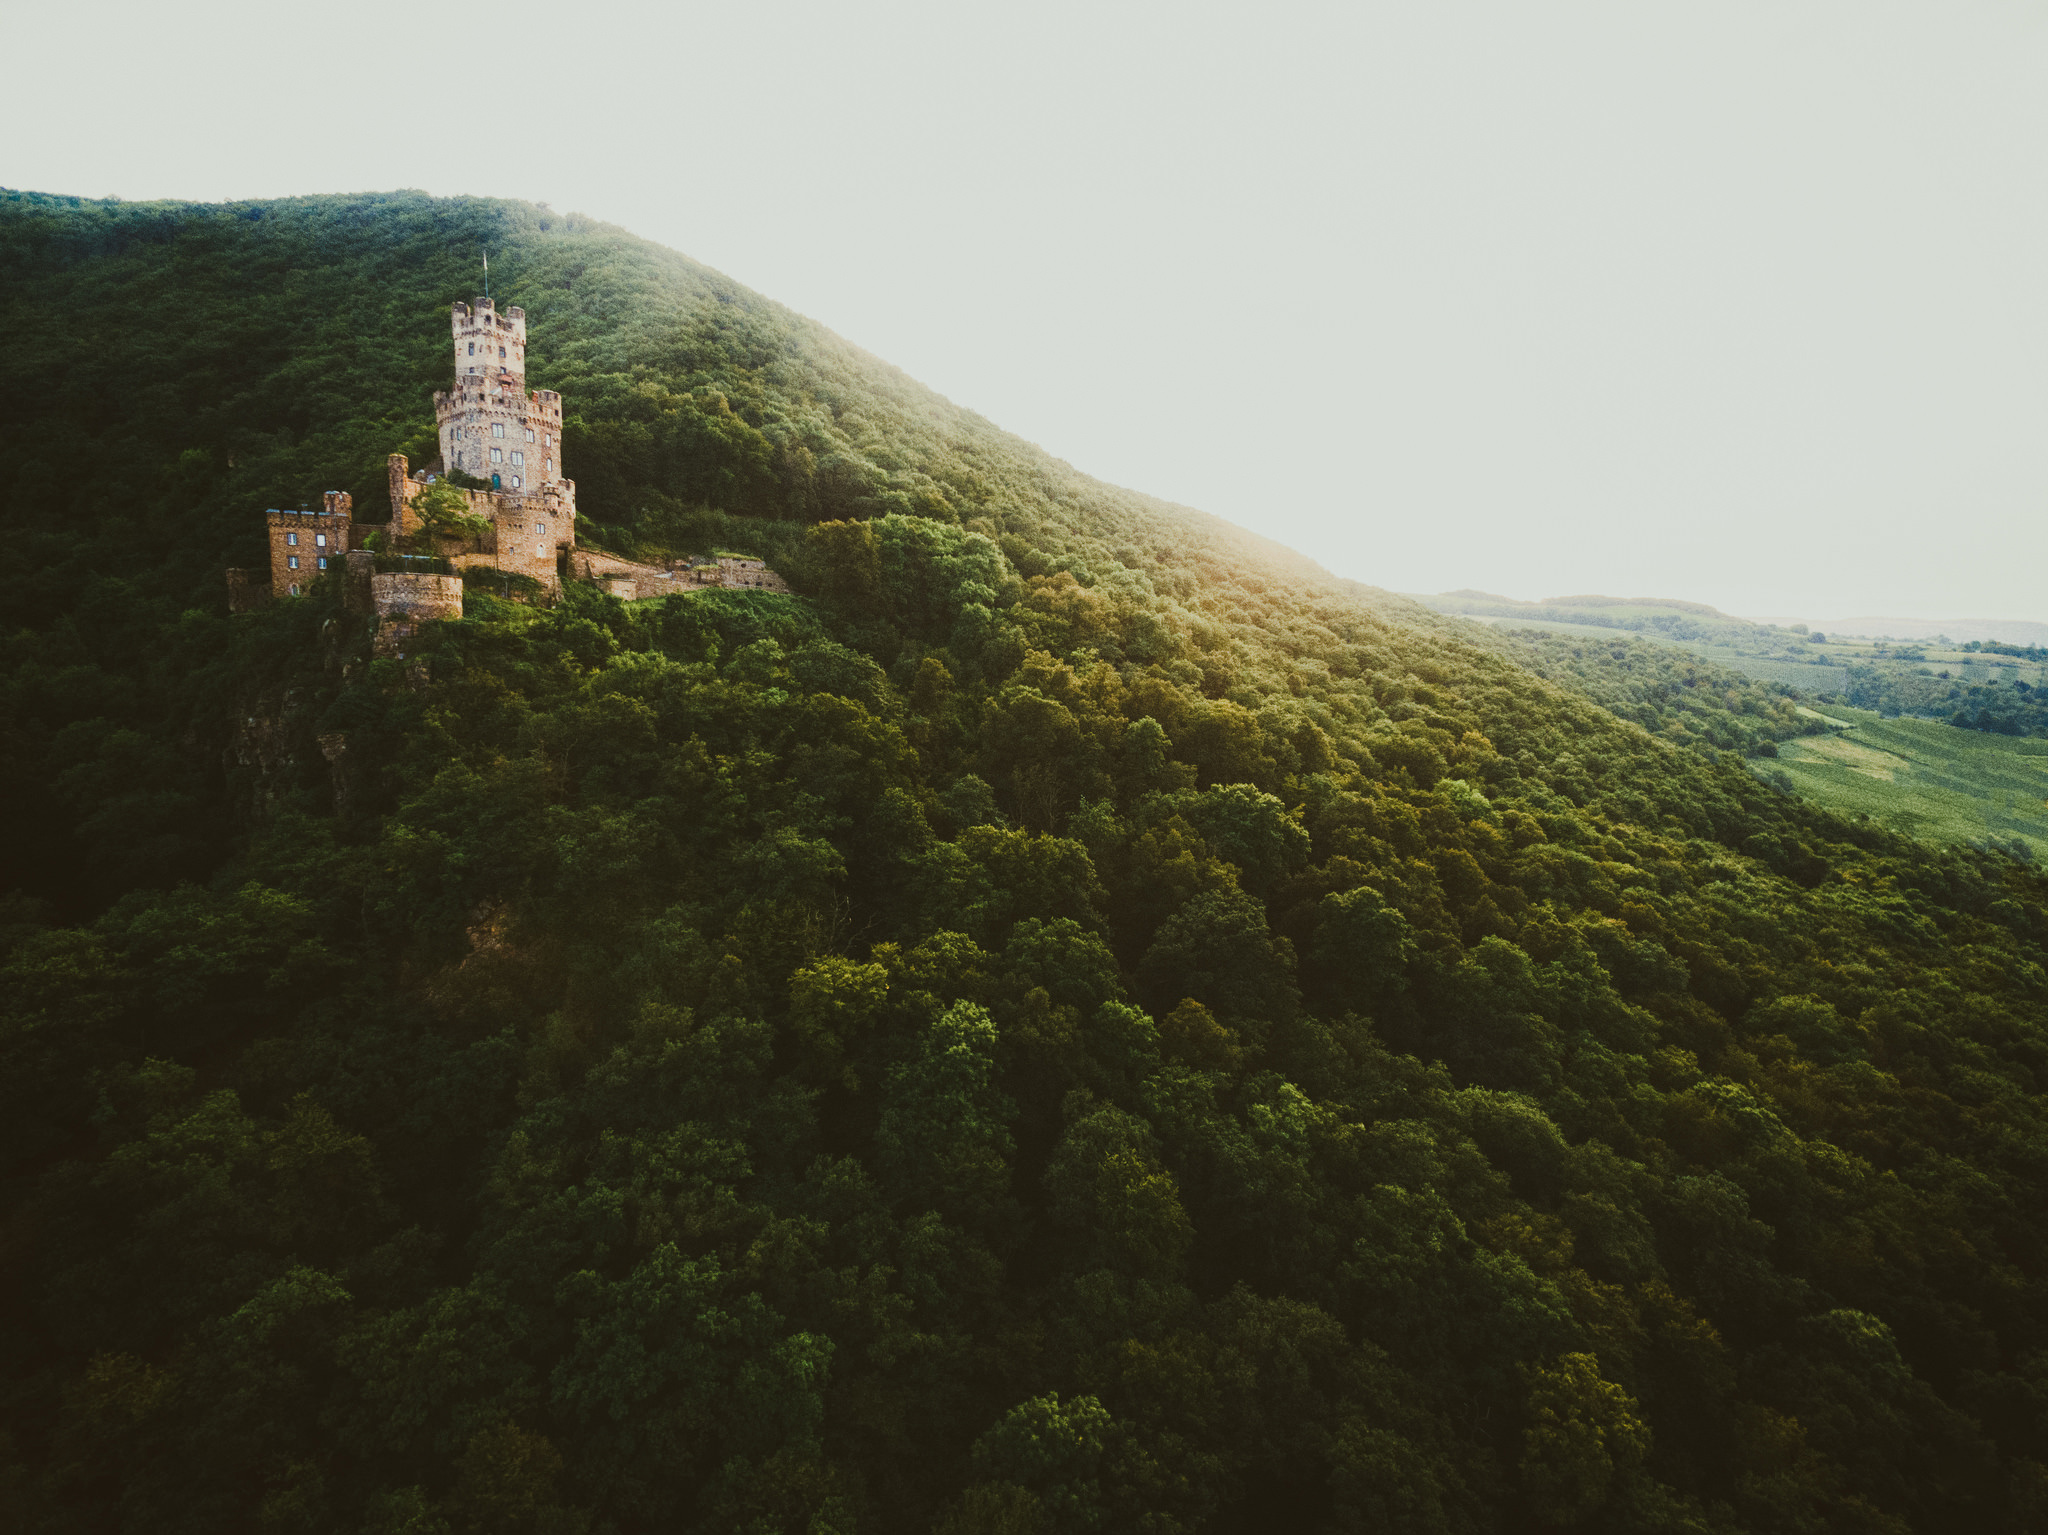 Landschaftsfotografie fotograf filmemacher frankfurt patrick schmetzer drohne landschaft natur 26